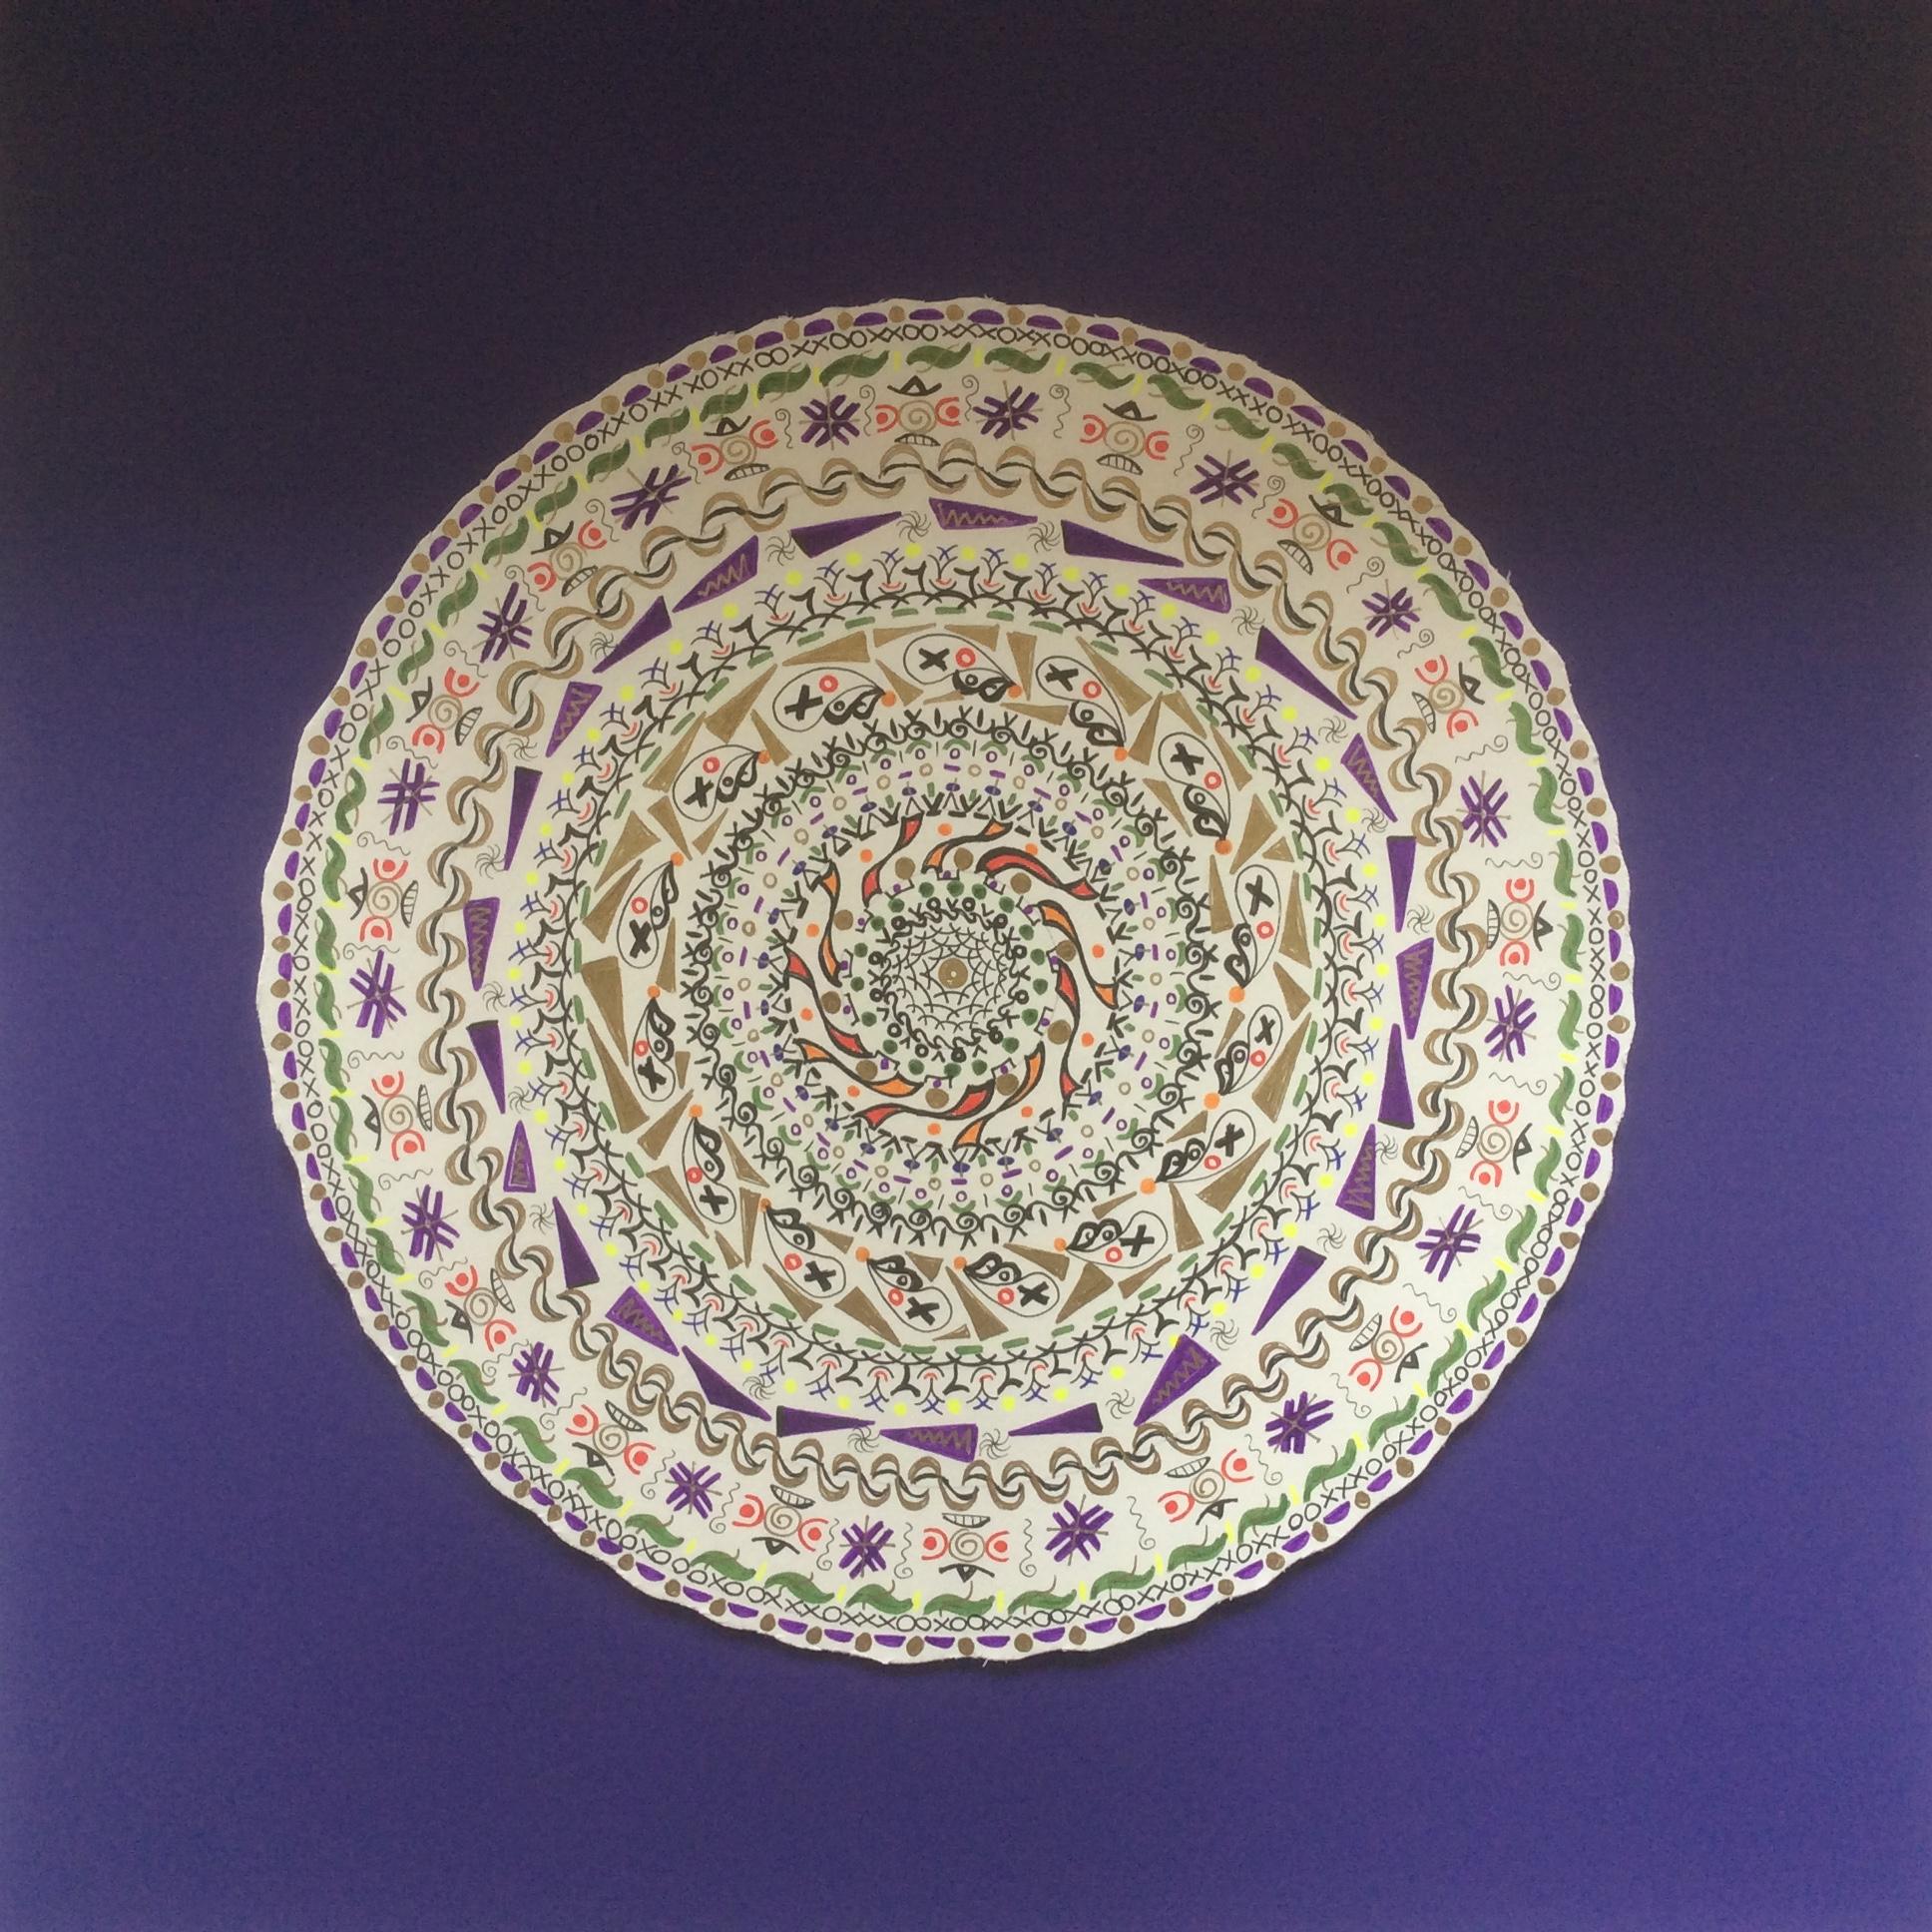 Mandala originally dark purple background